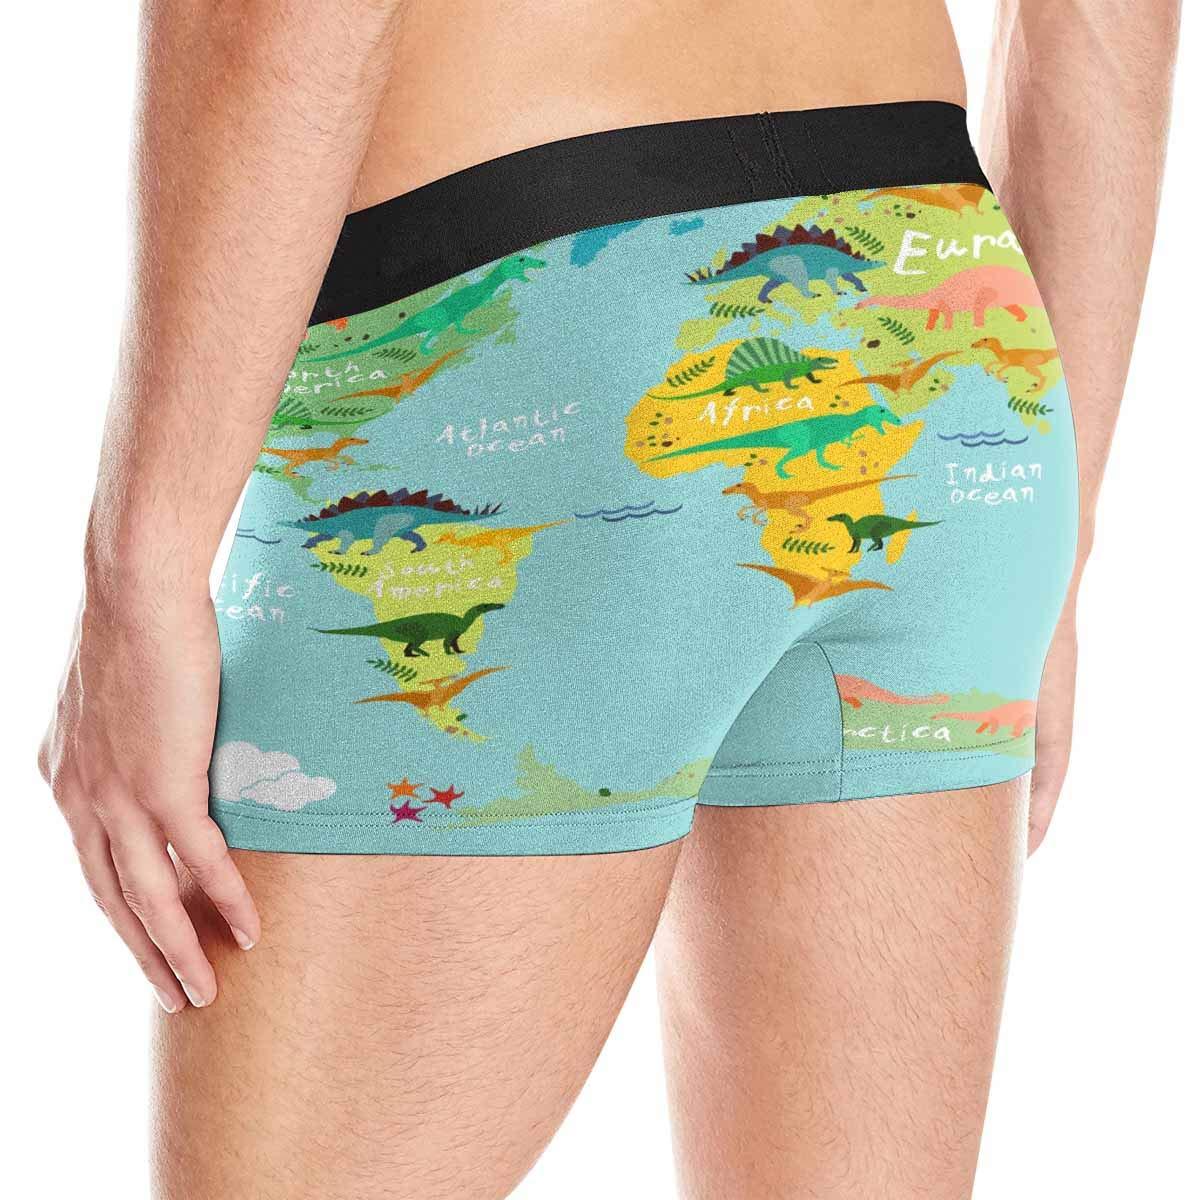 XS-3XL INTERESTPRINT Boxer Briefs Mens Underwear Dinosaurs World Map